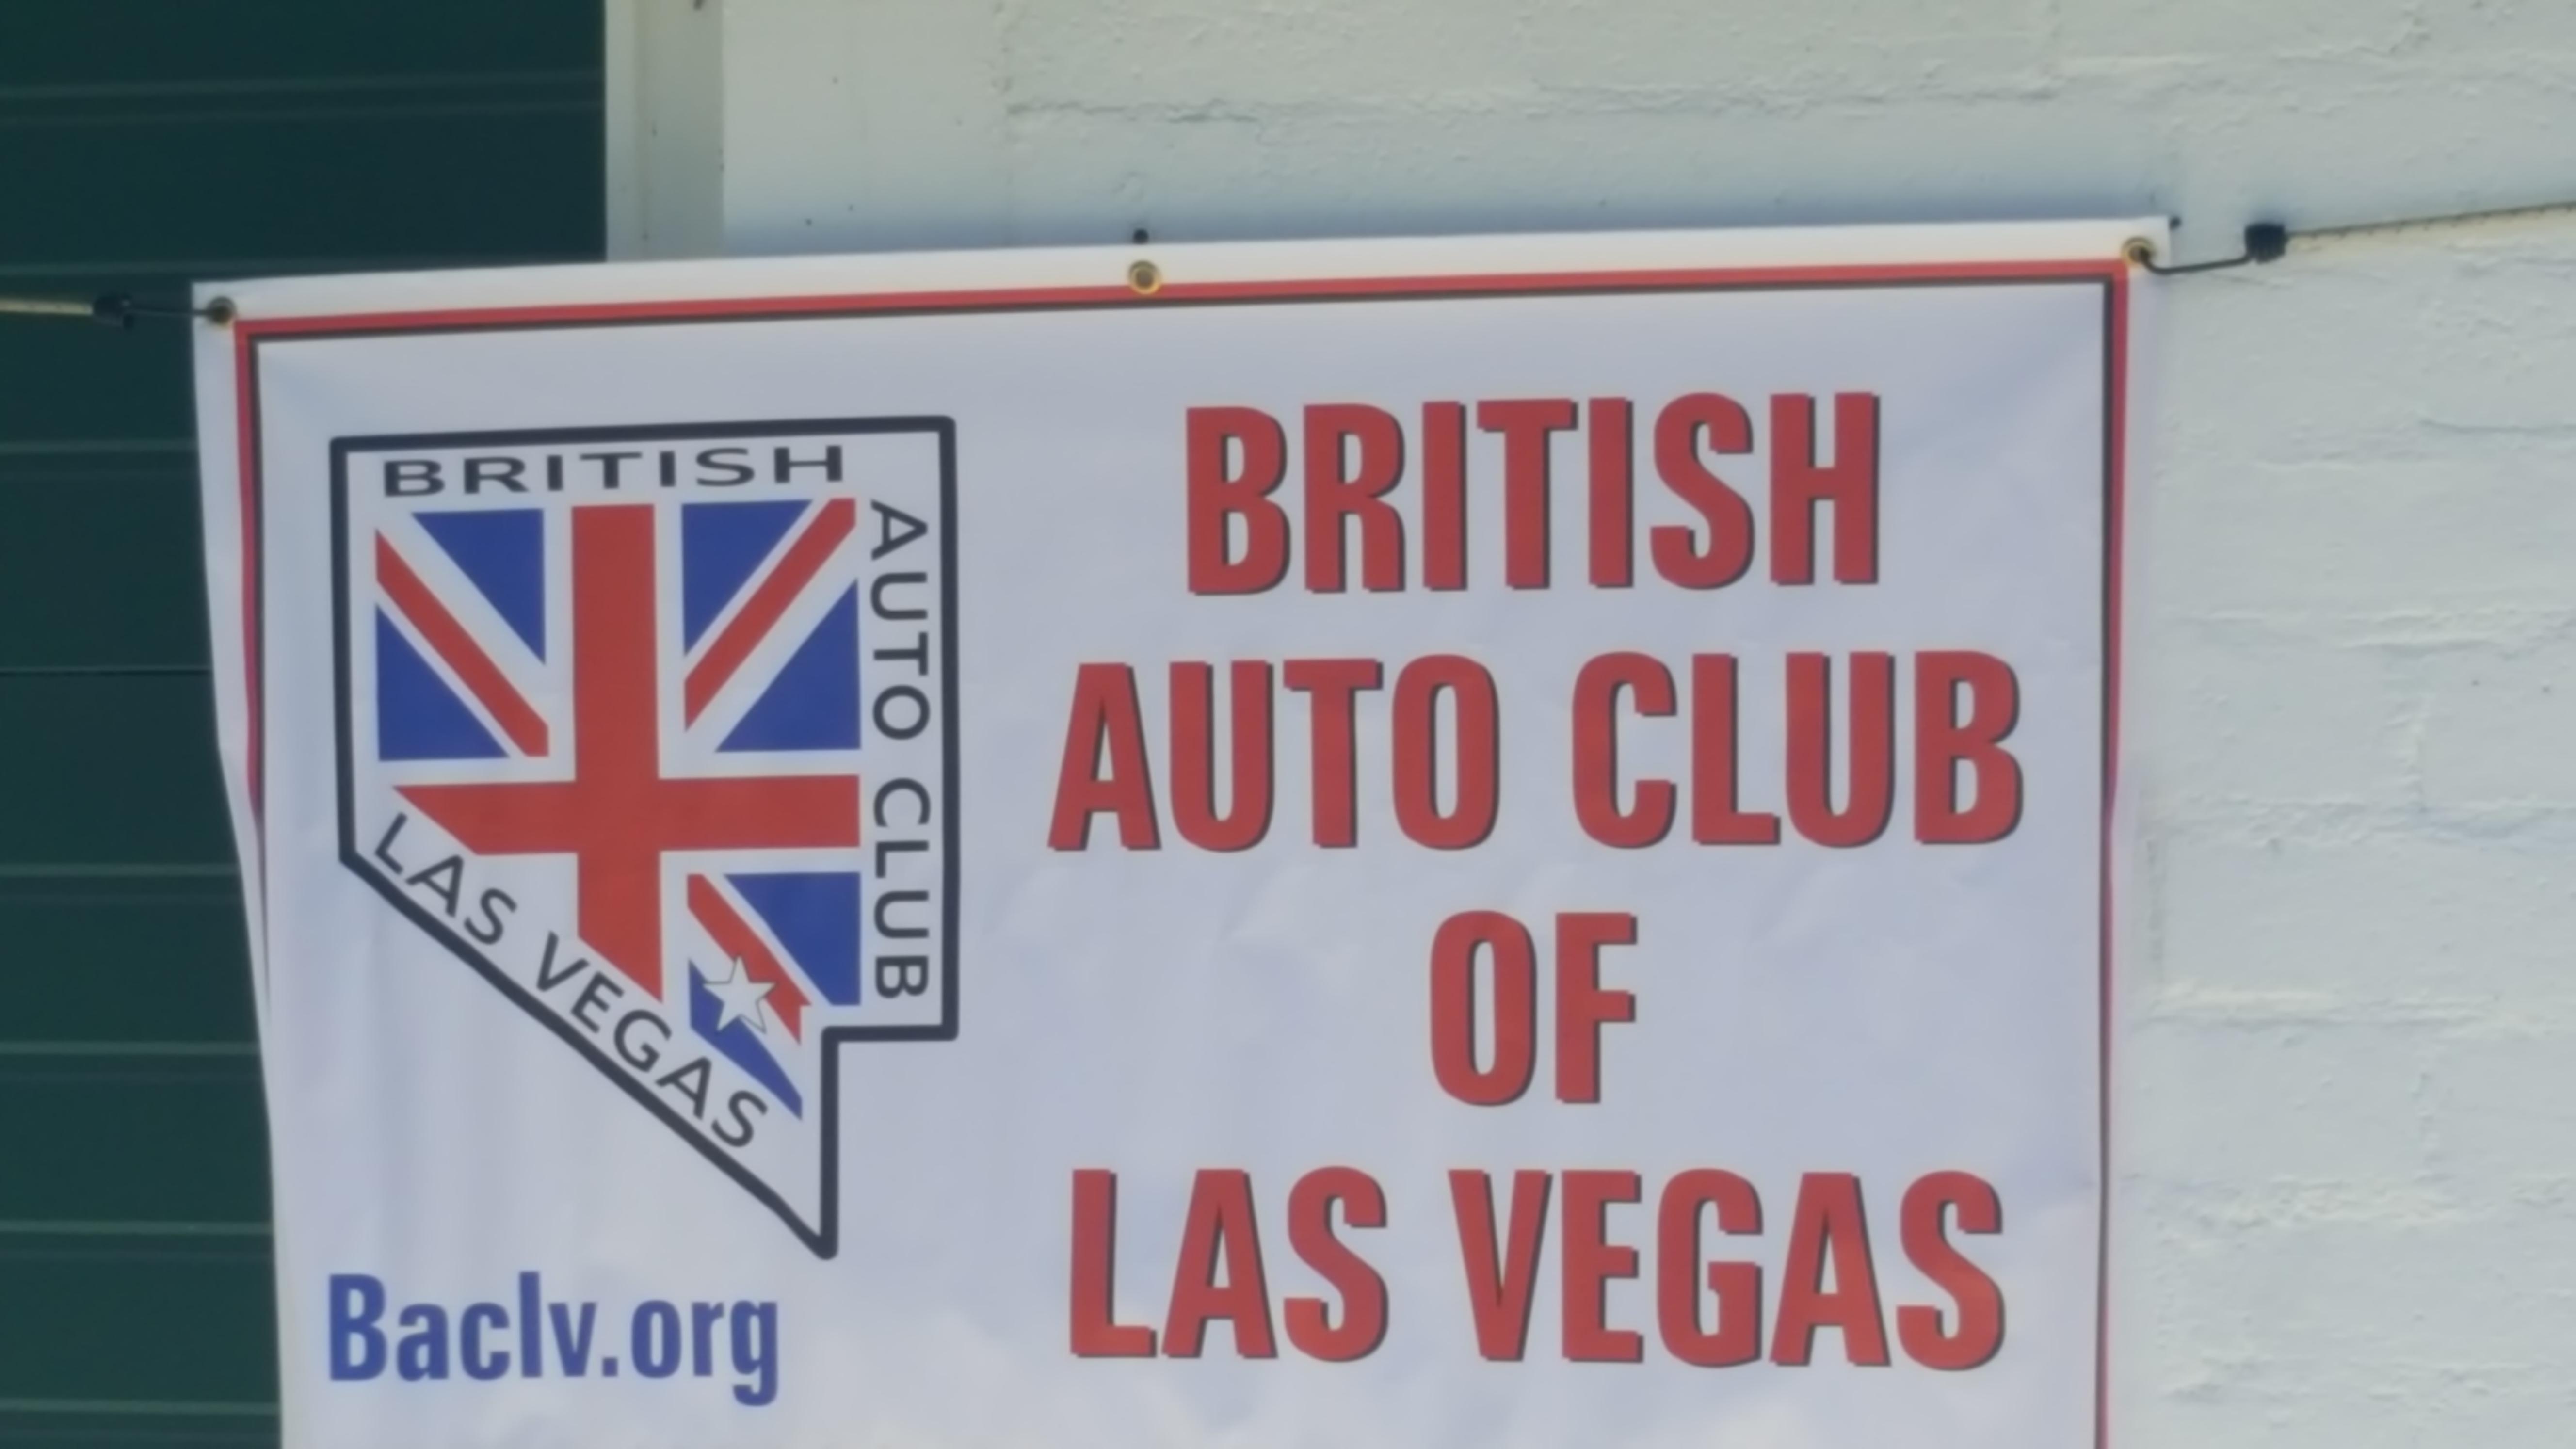 British Auto Club of LV